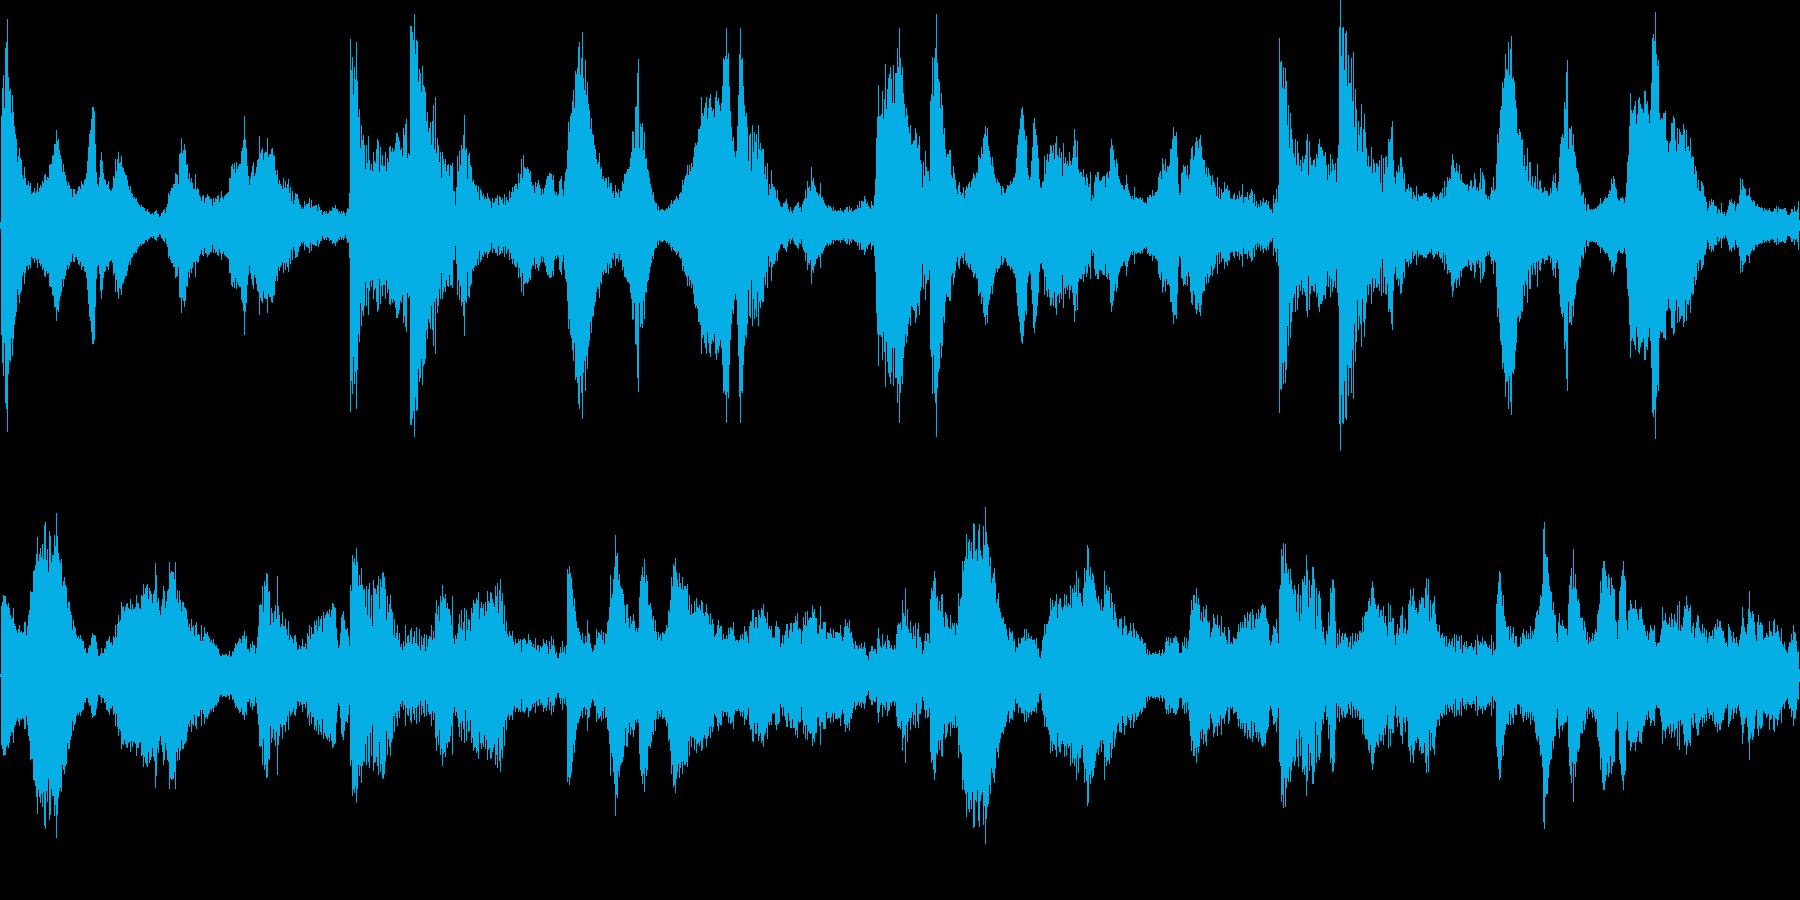 k010 アラーム音(ループ仕様)の再生済みの波形